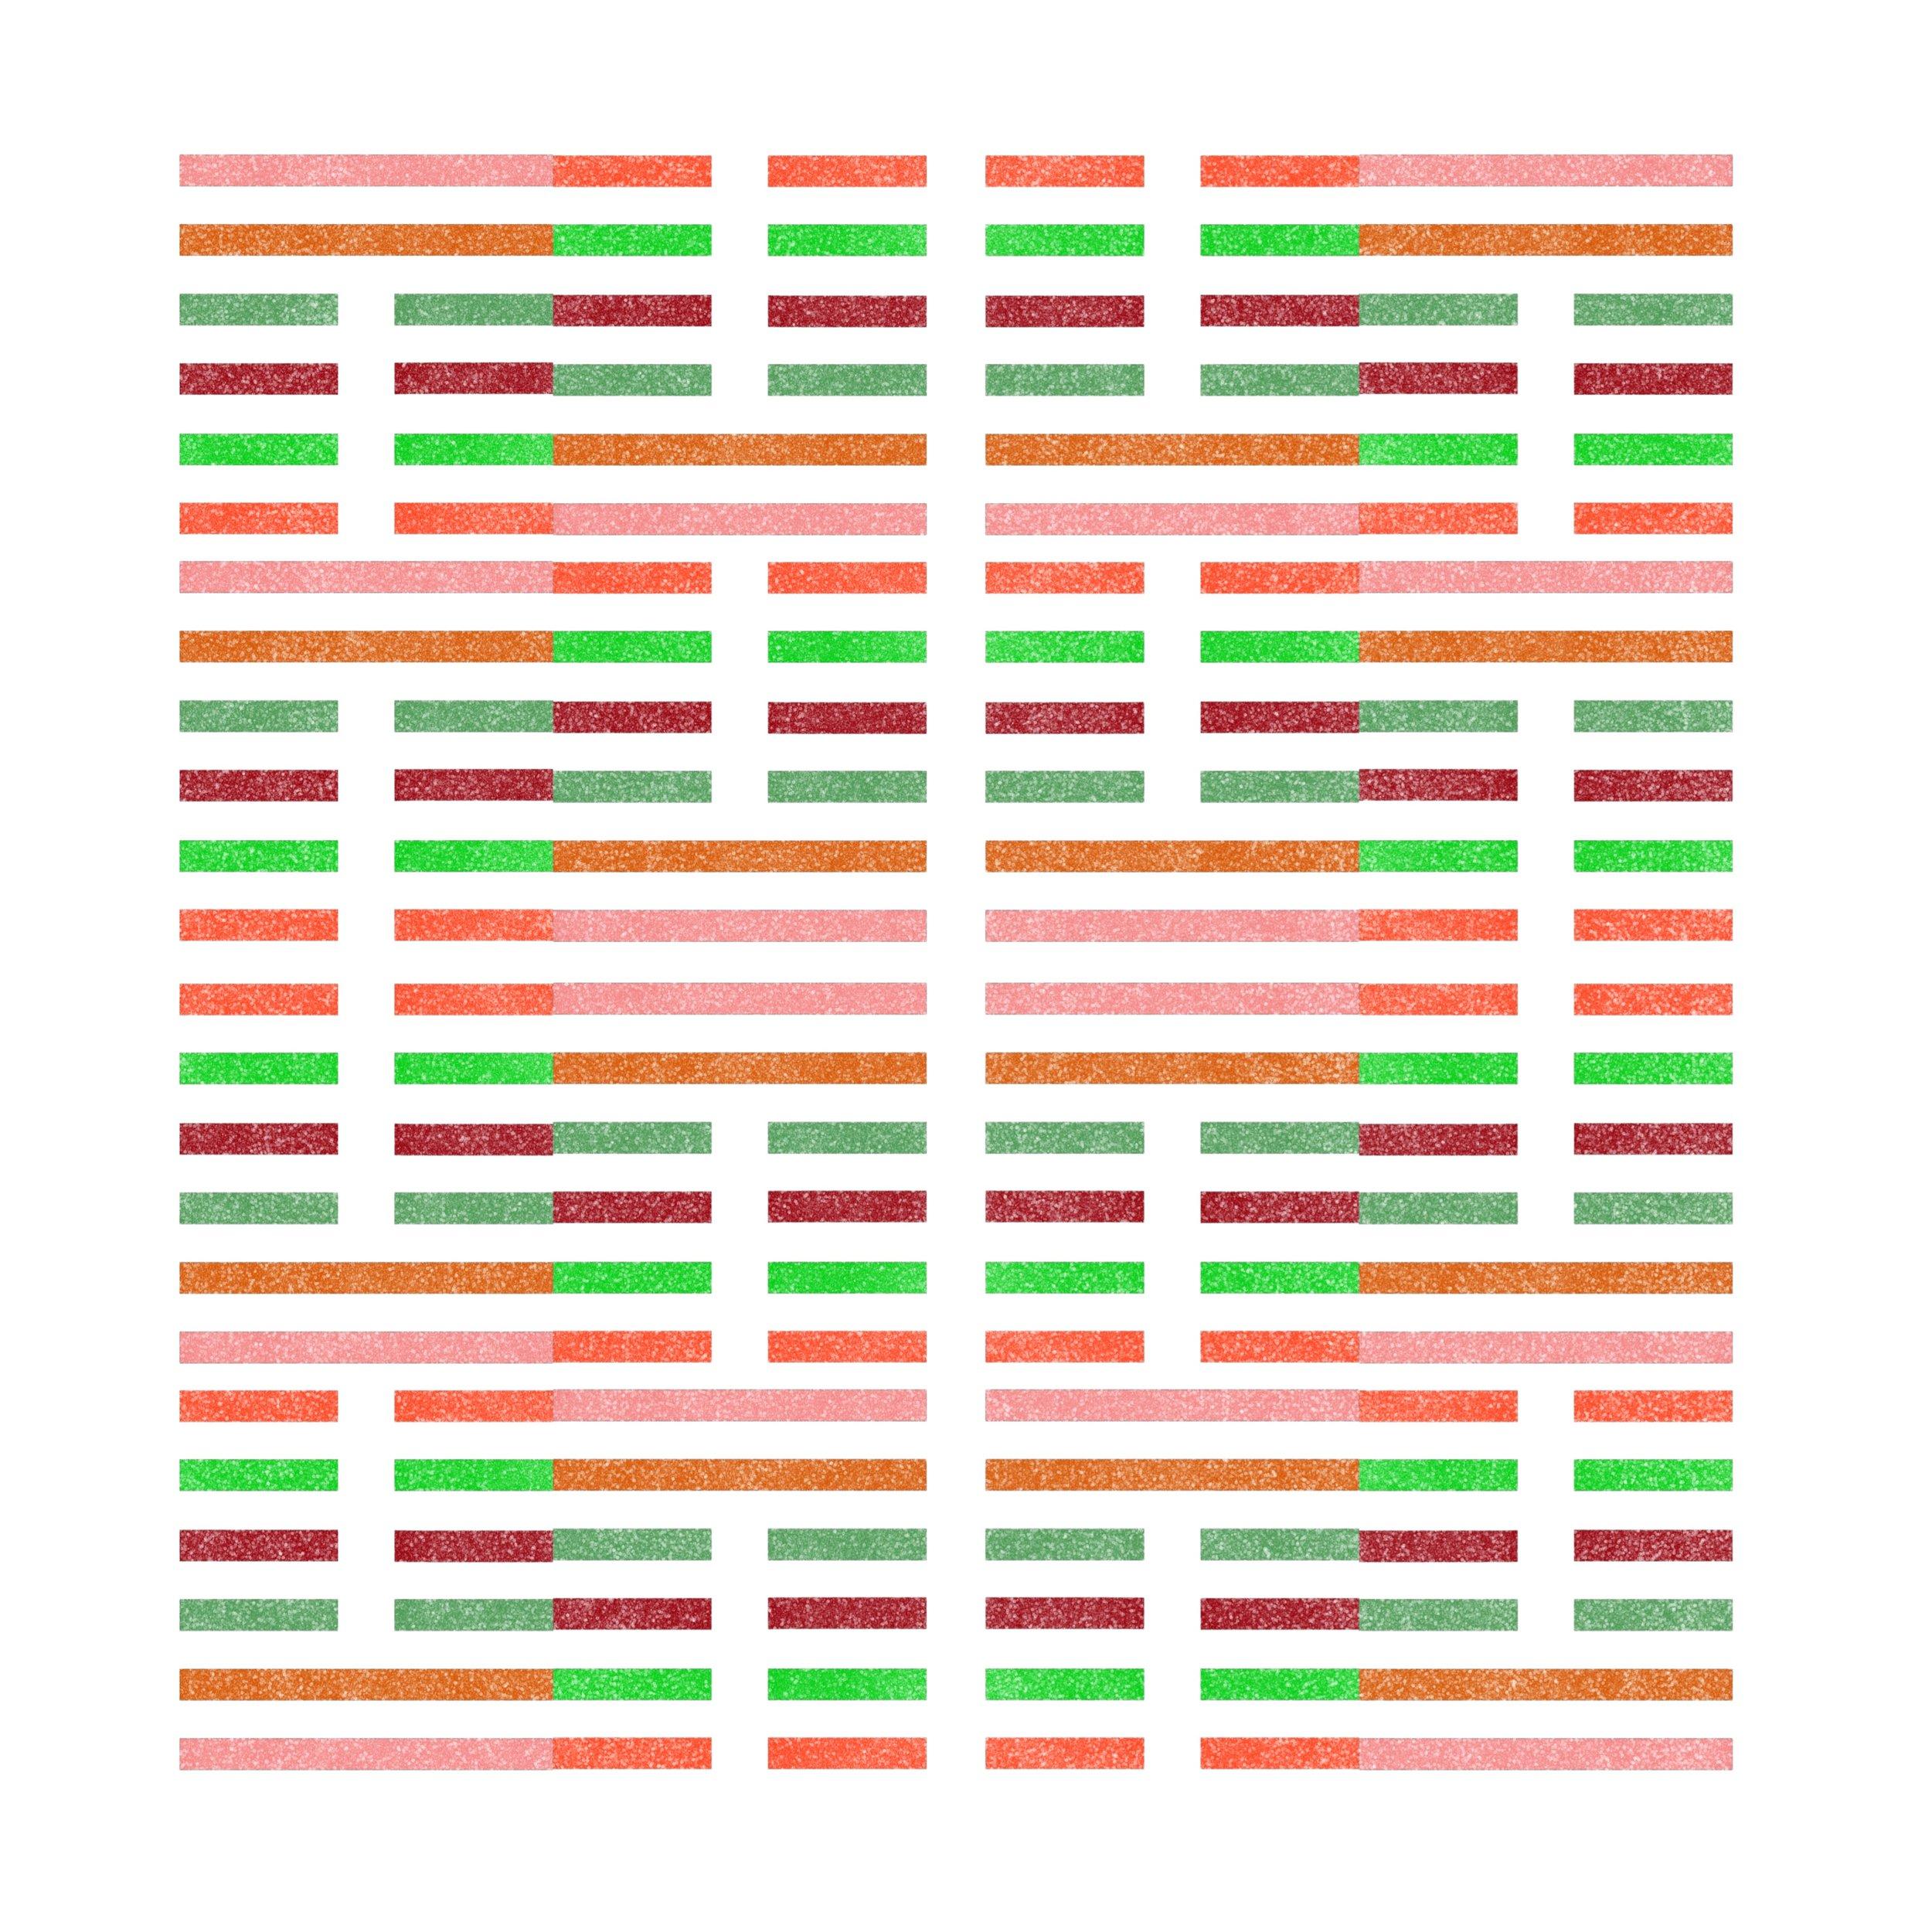 I Ching Hexagram 2: Viewing / Contemplation